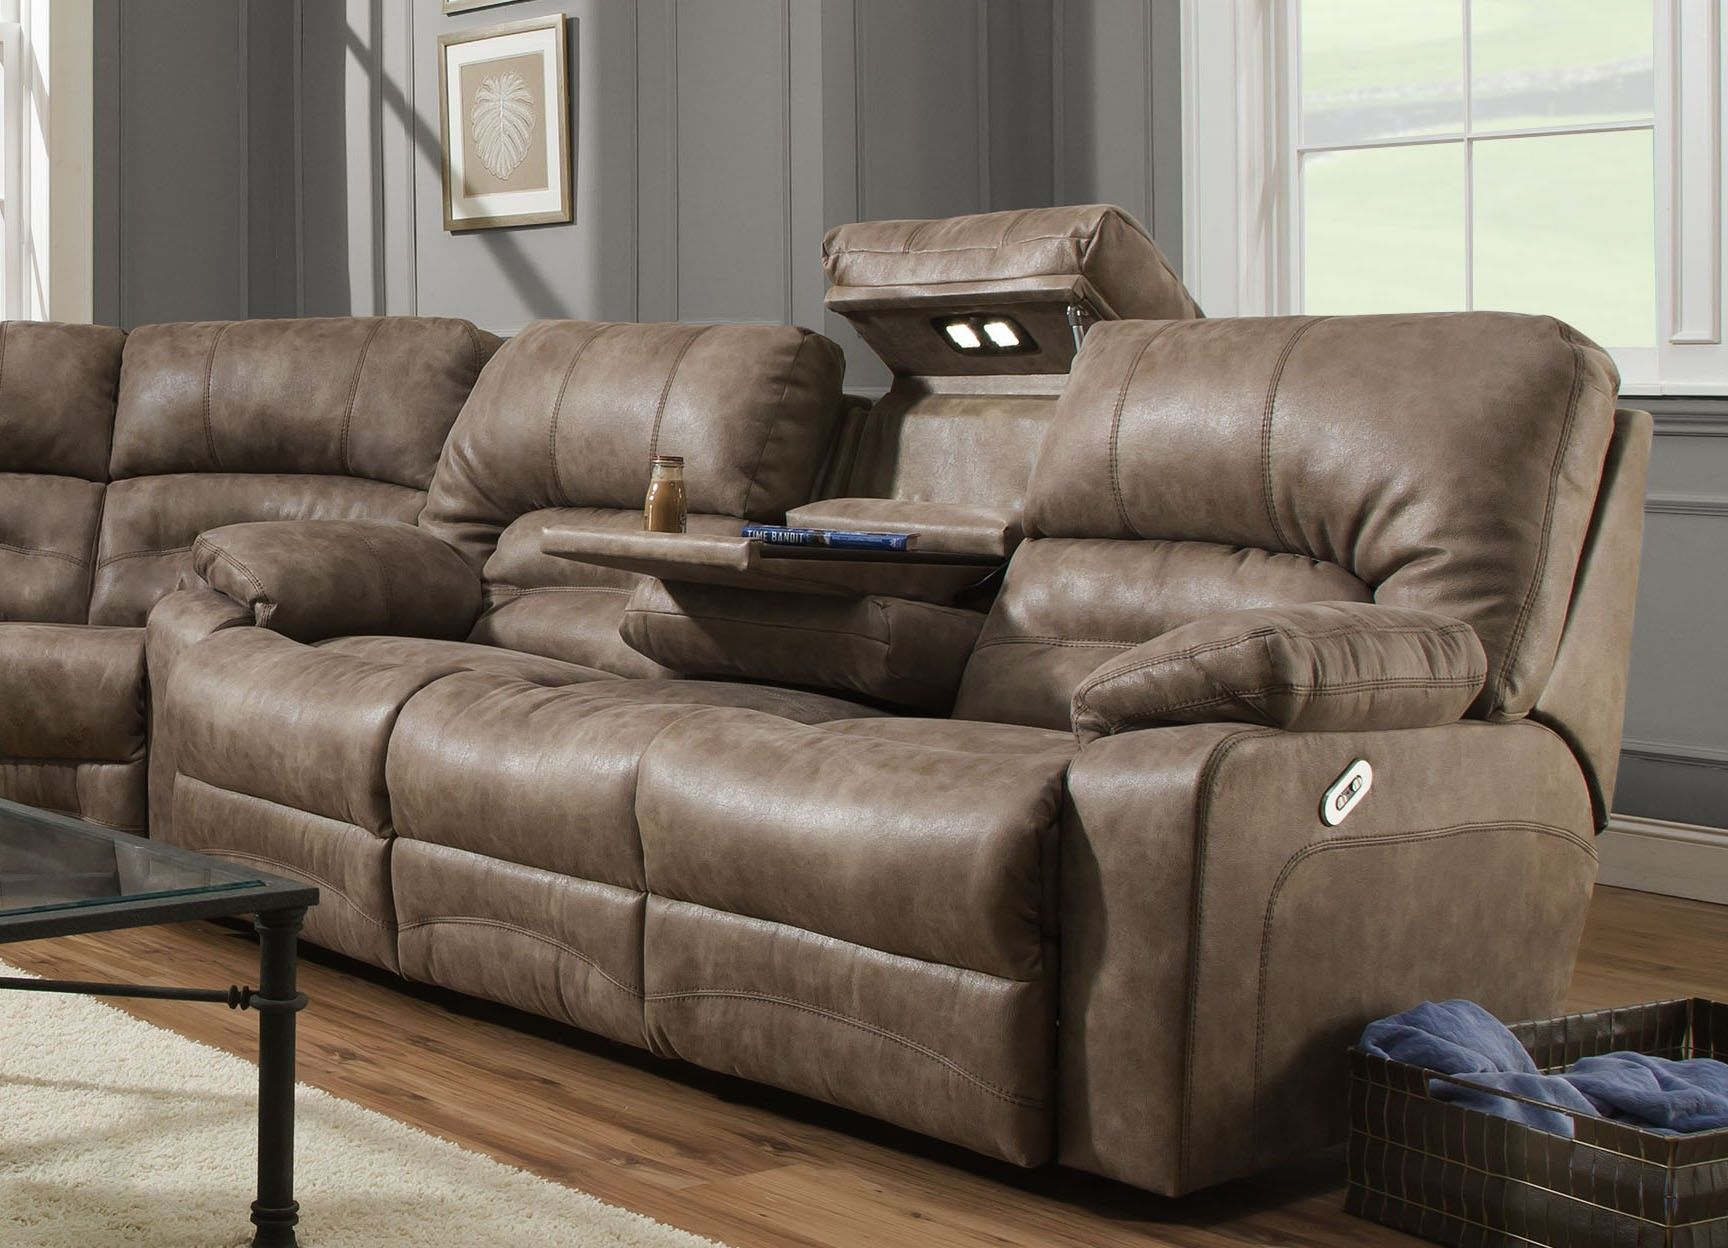 Leather Reclining Sofa With Fold Down Console Di 2020 Dengan Gambar